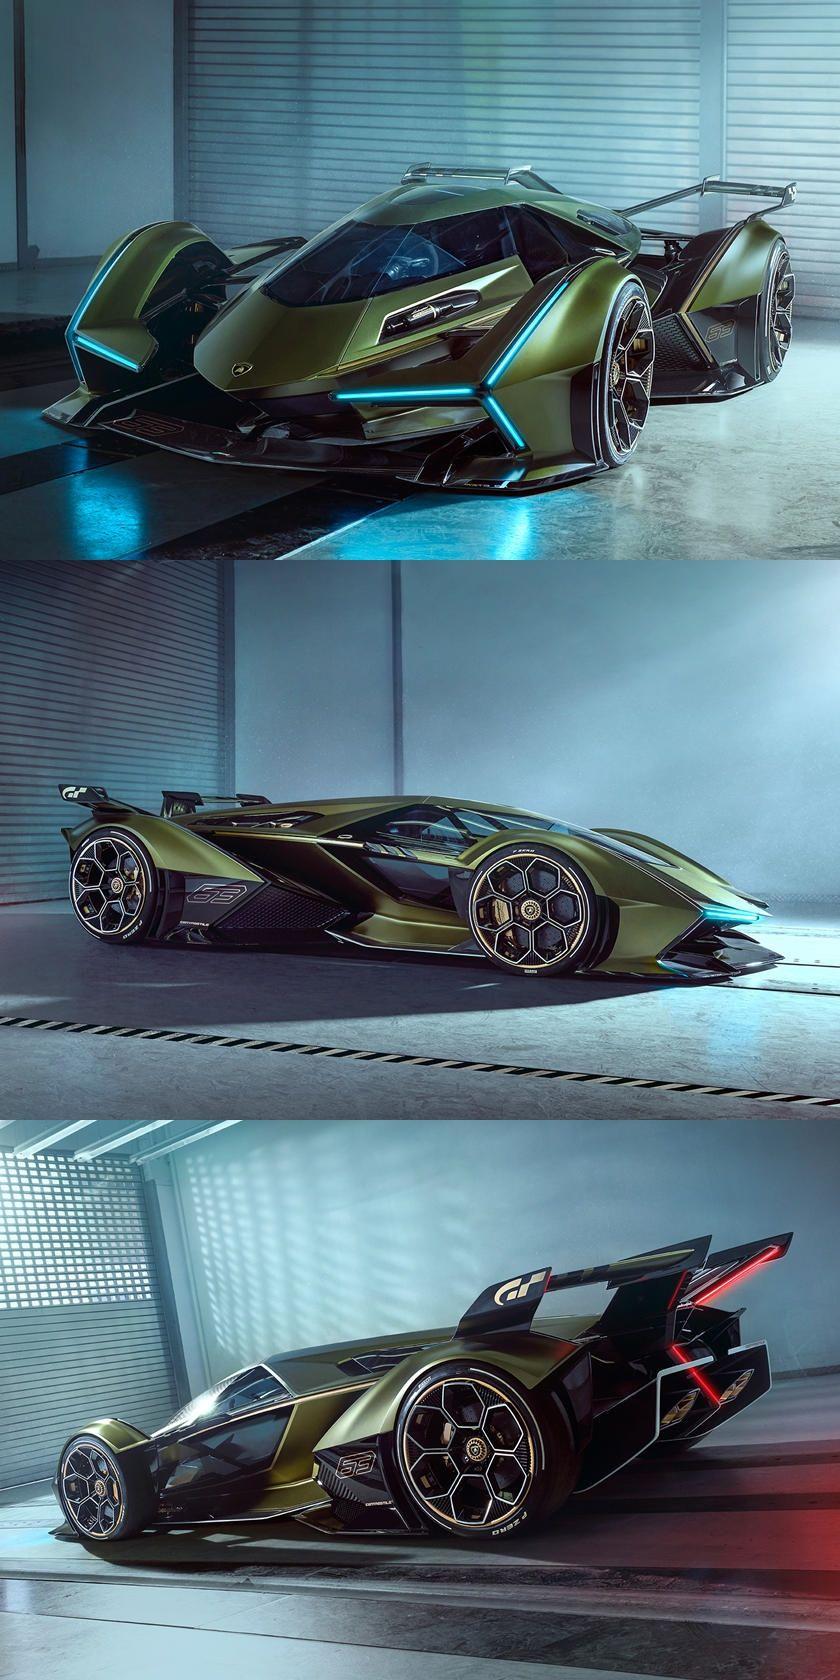 Lamborghini Lambo V12 Vision Gran Turismo Is Absolutely Wild